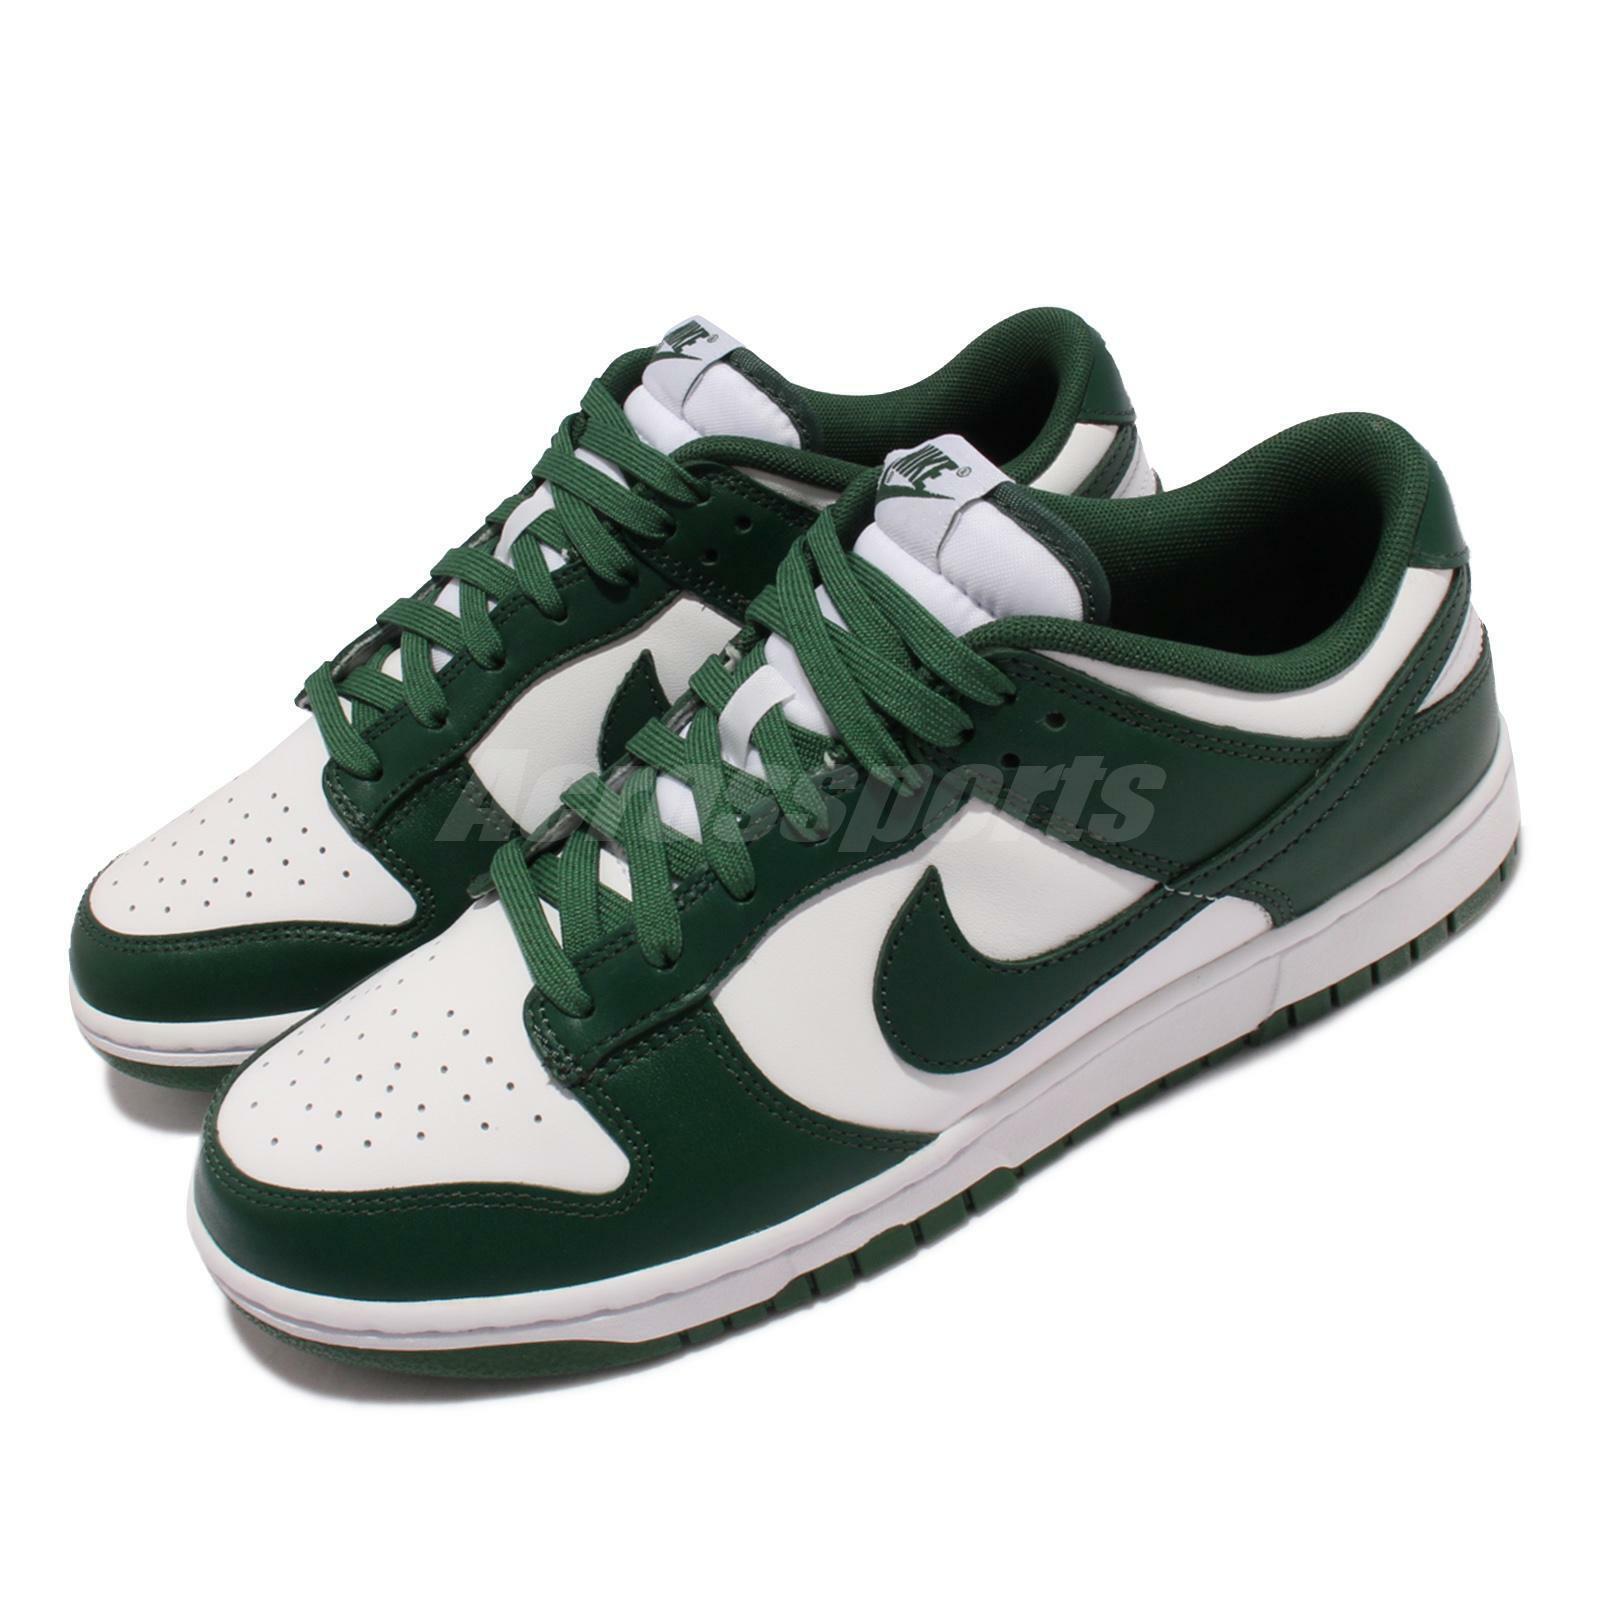 Nike Dunk Low Retro Michigan State Team Green White Men Casual Shoes DD1391-101